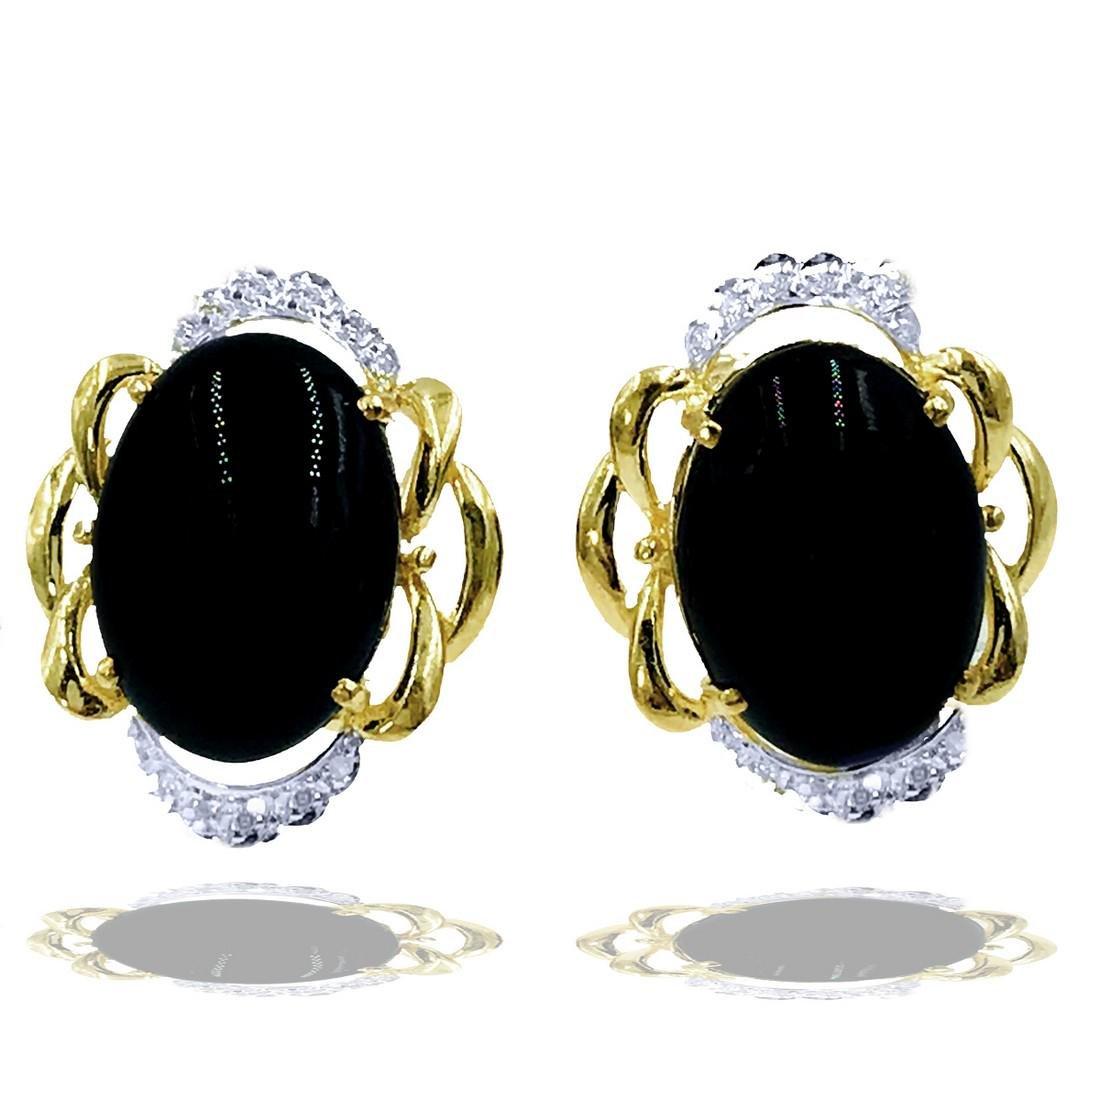 Black Onyx and Diamond Earrings with Omega Backs